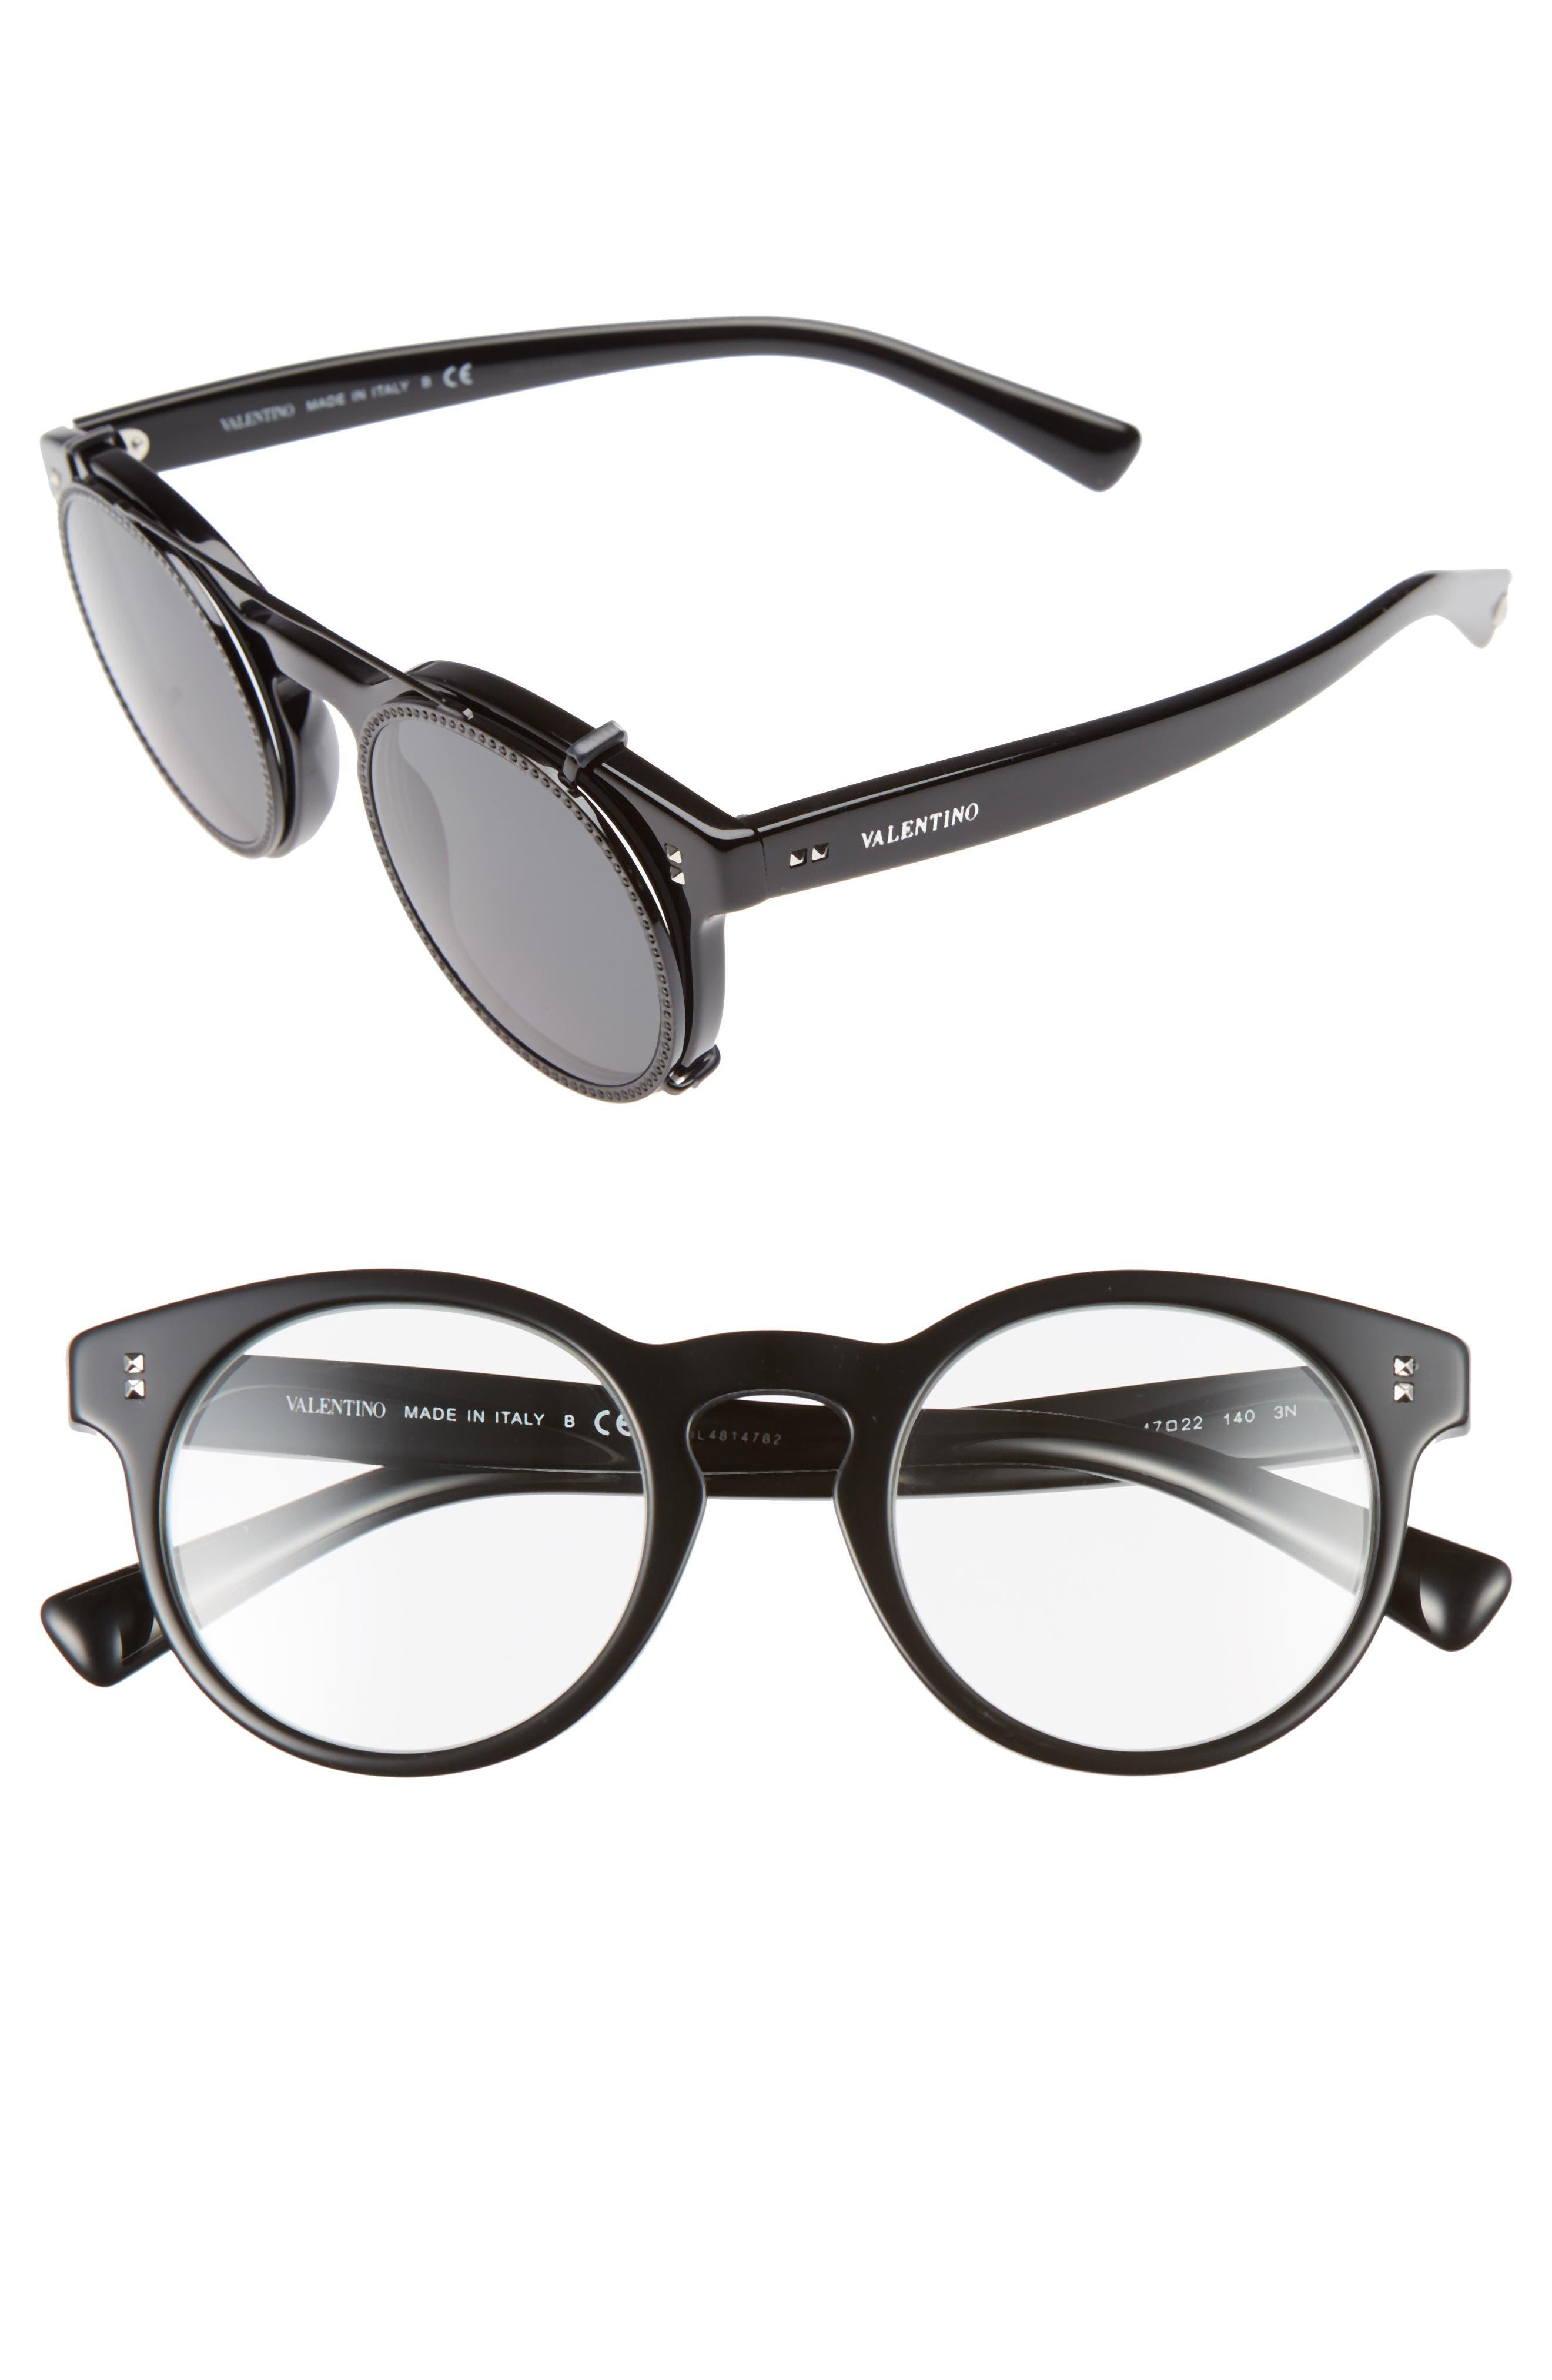 47mm Round Sunglasses,                         Main,                         color, Black/ Black Swarovski